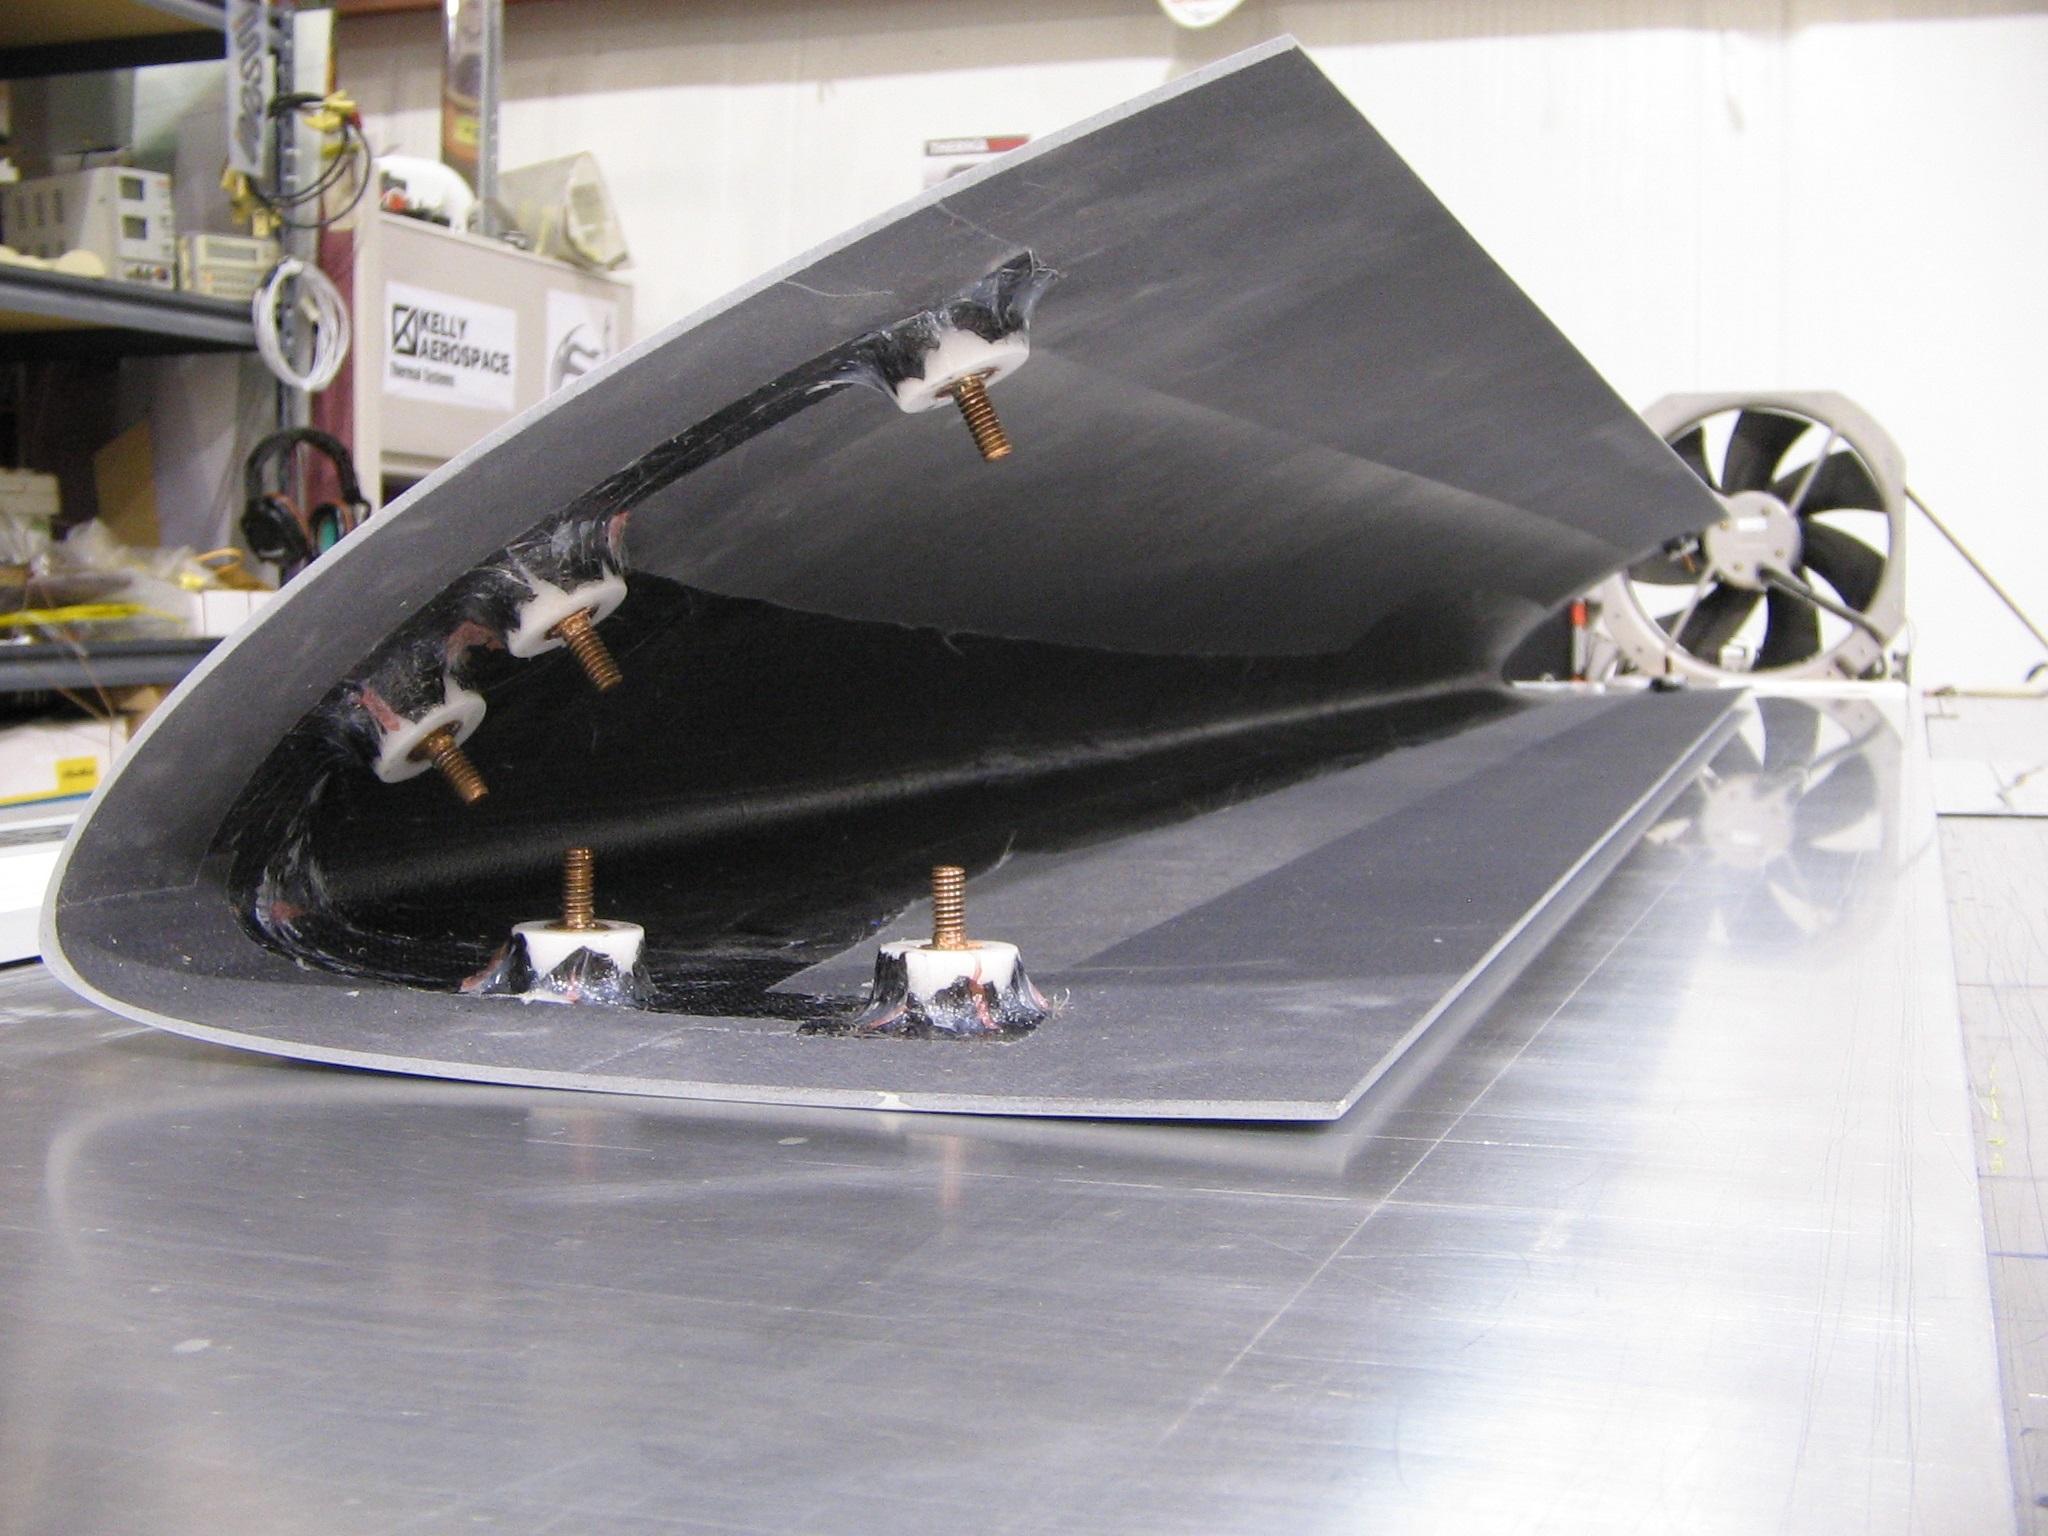 Composite, mold making, fiberglass layup